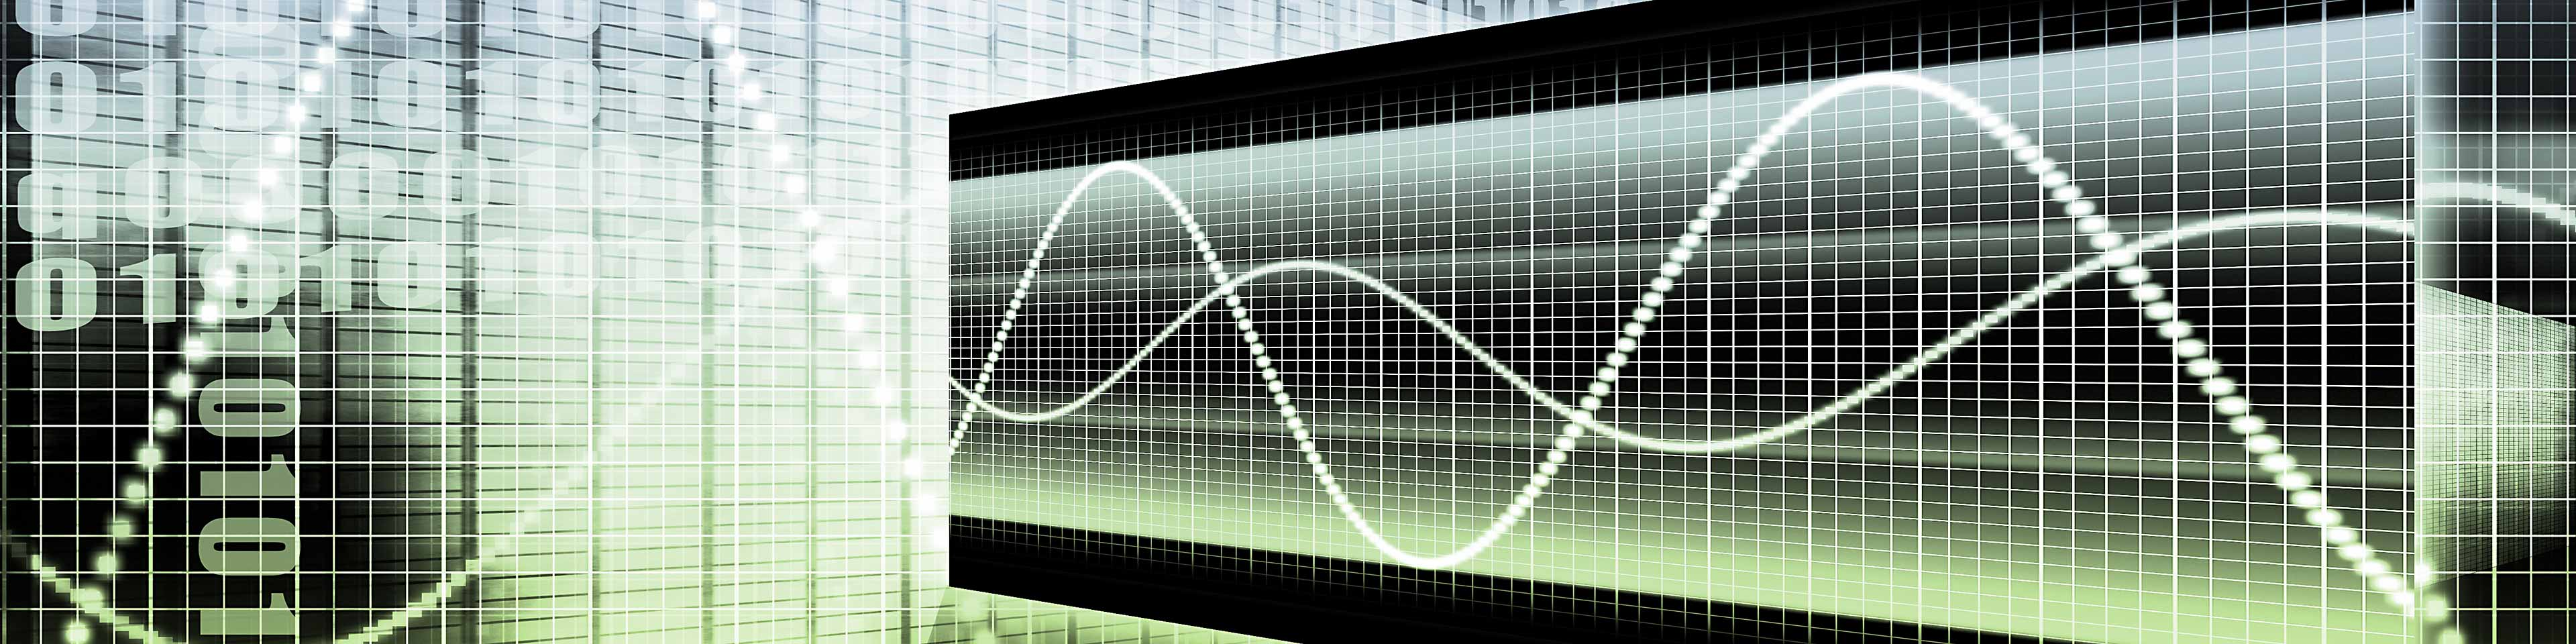 abstract digital graph